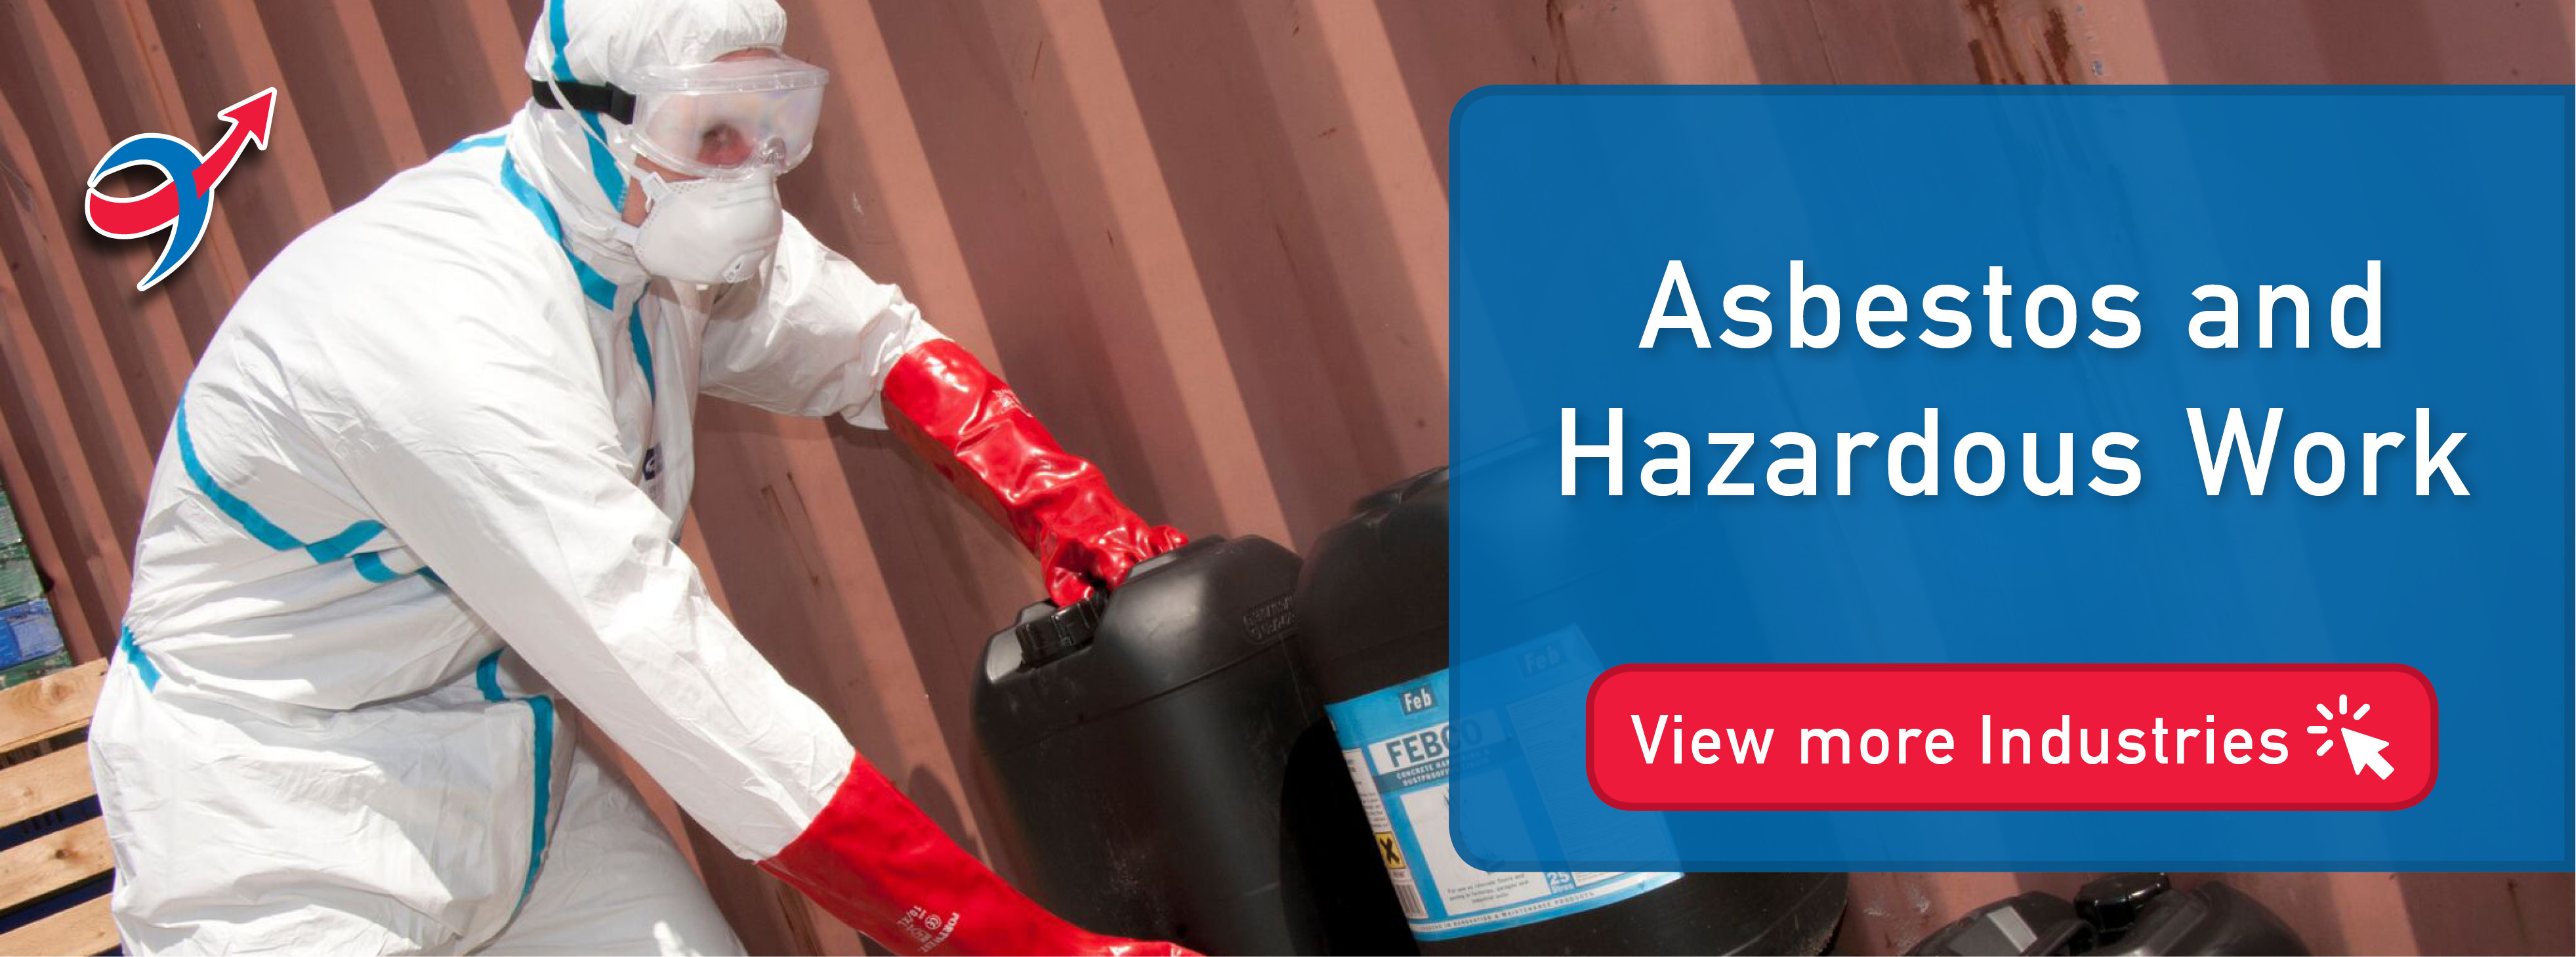 Asbestos and Hazardous Work